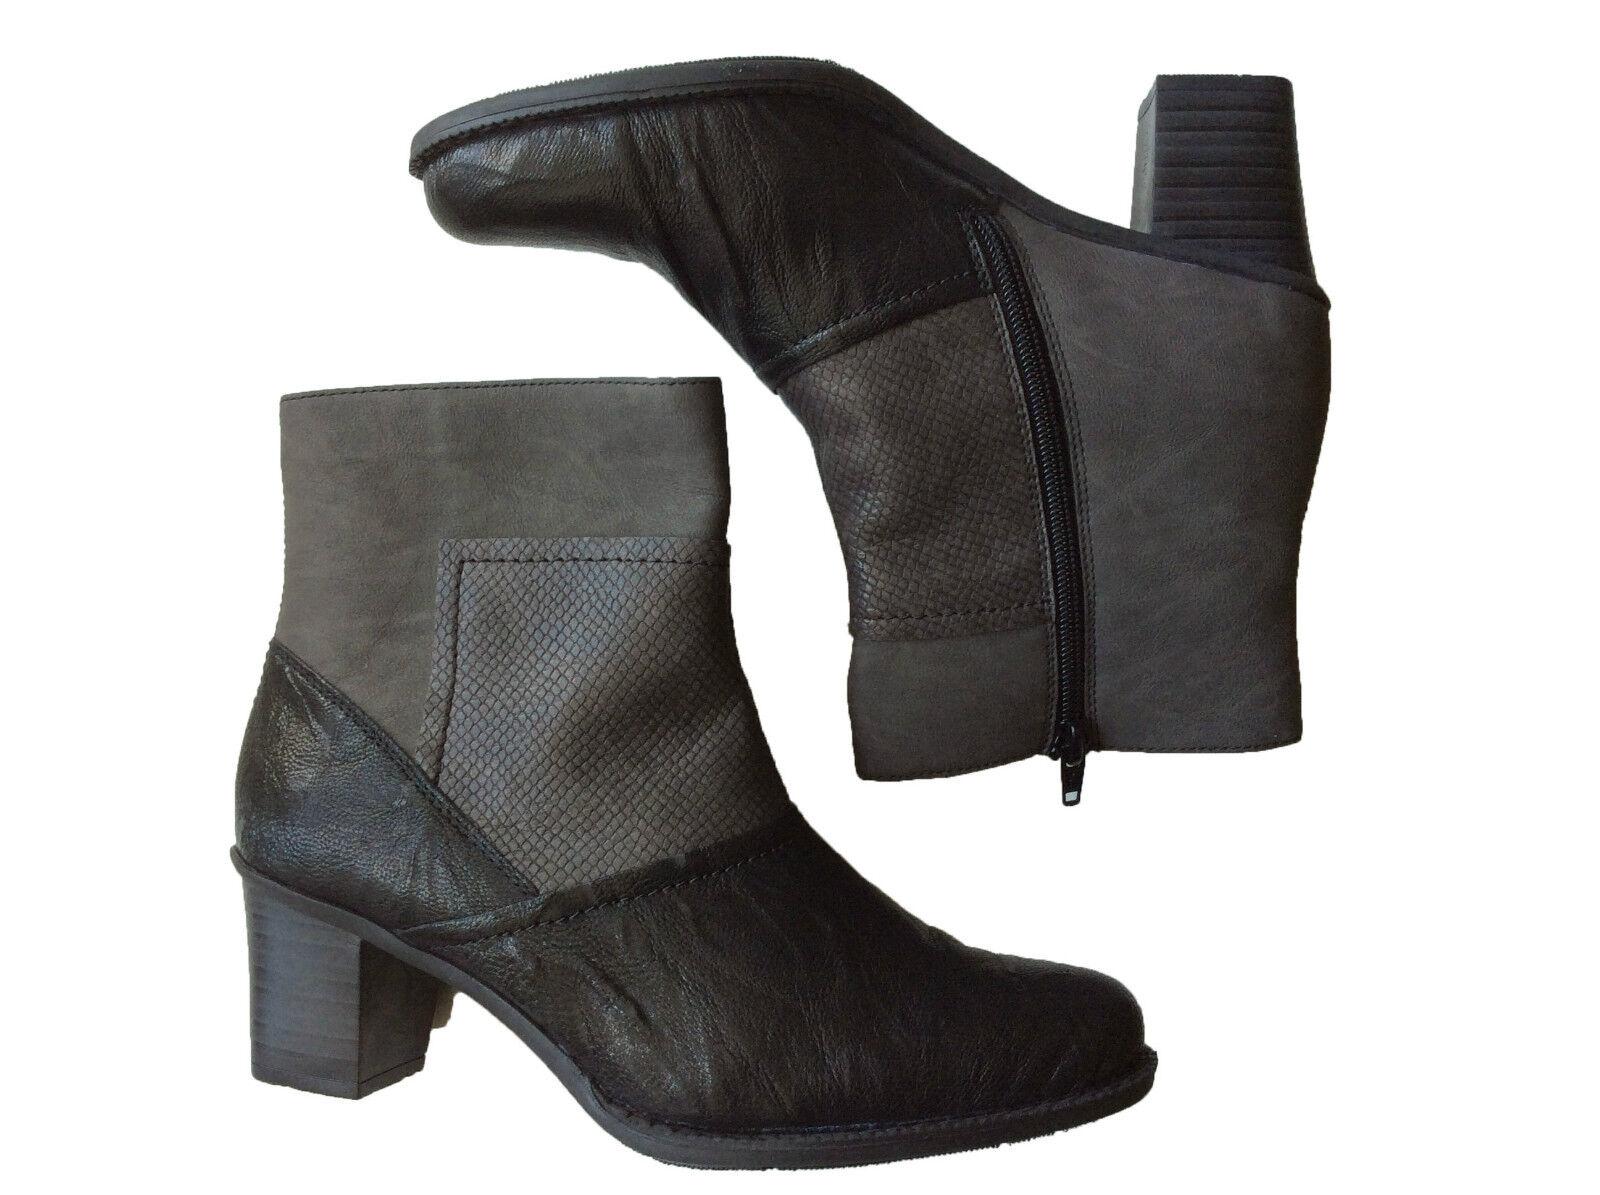 Rieker Stiefelette Stiefel Winter Damen Schuhe LEDER schwarz grau elegant 161177